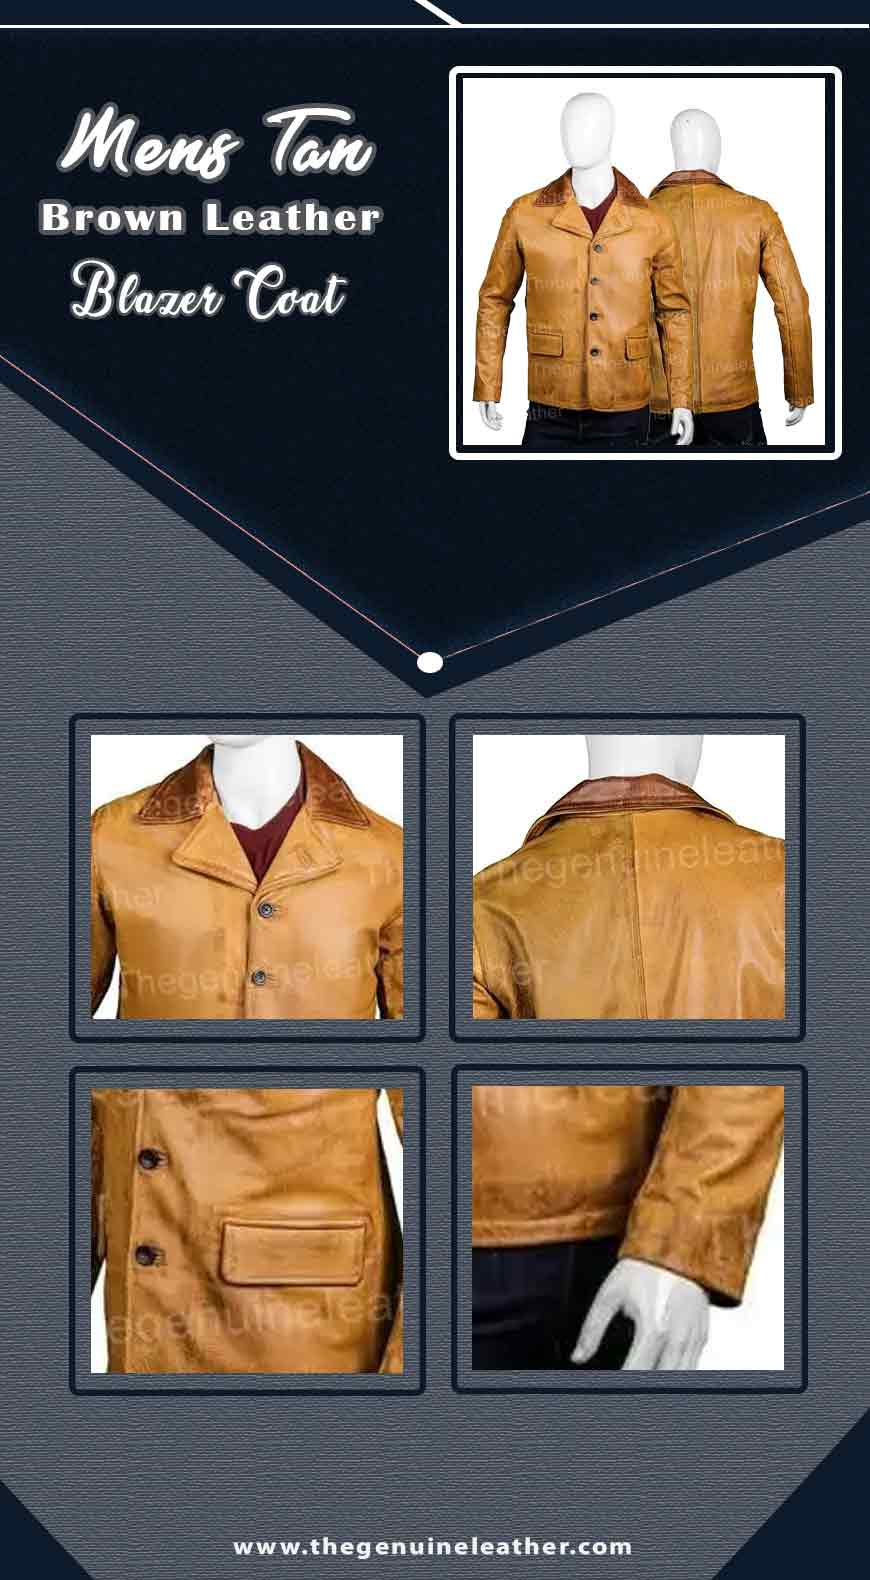 Mens Tan Brown Leather Blazer Coat info